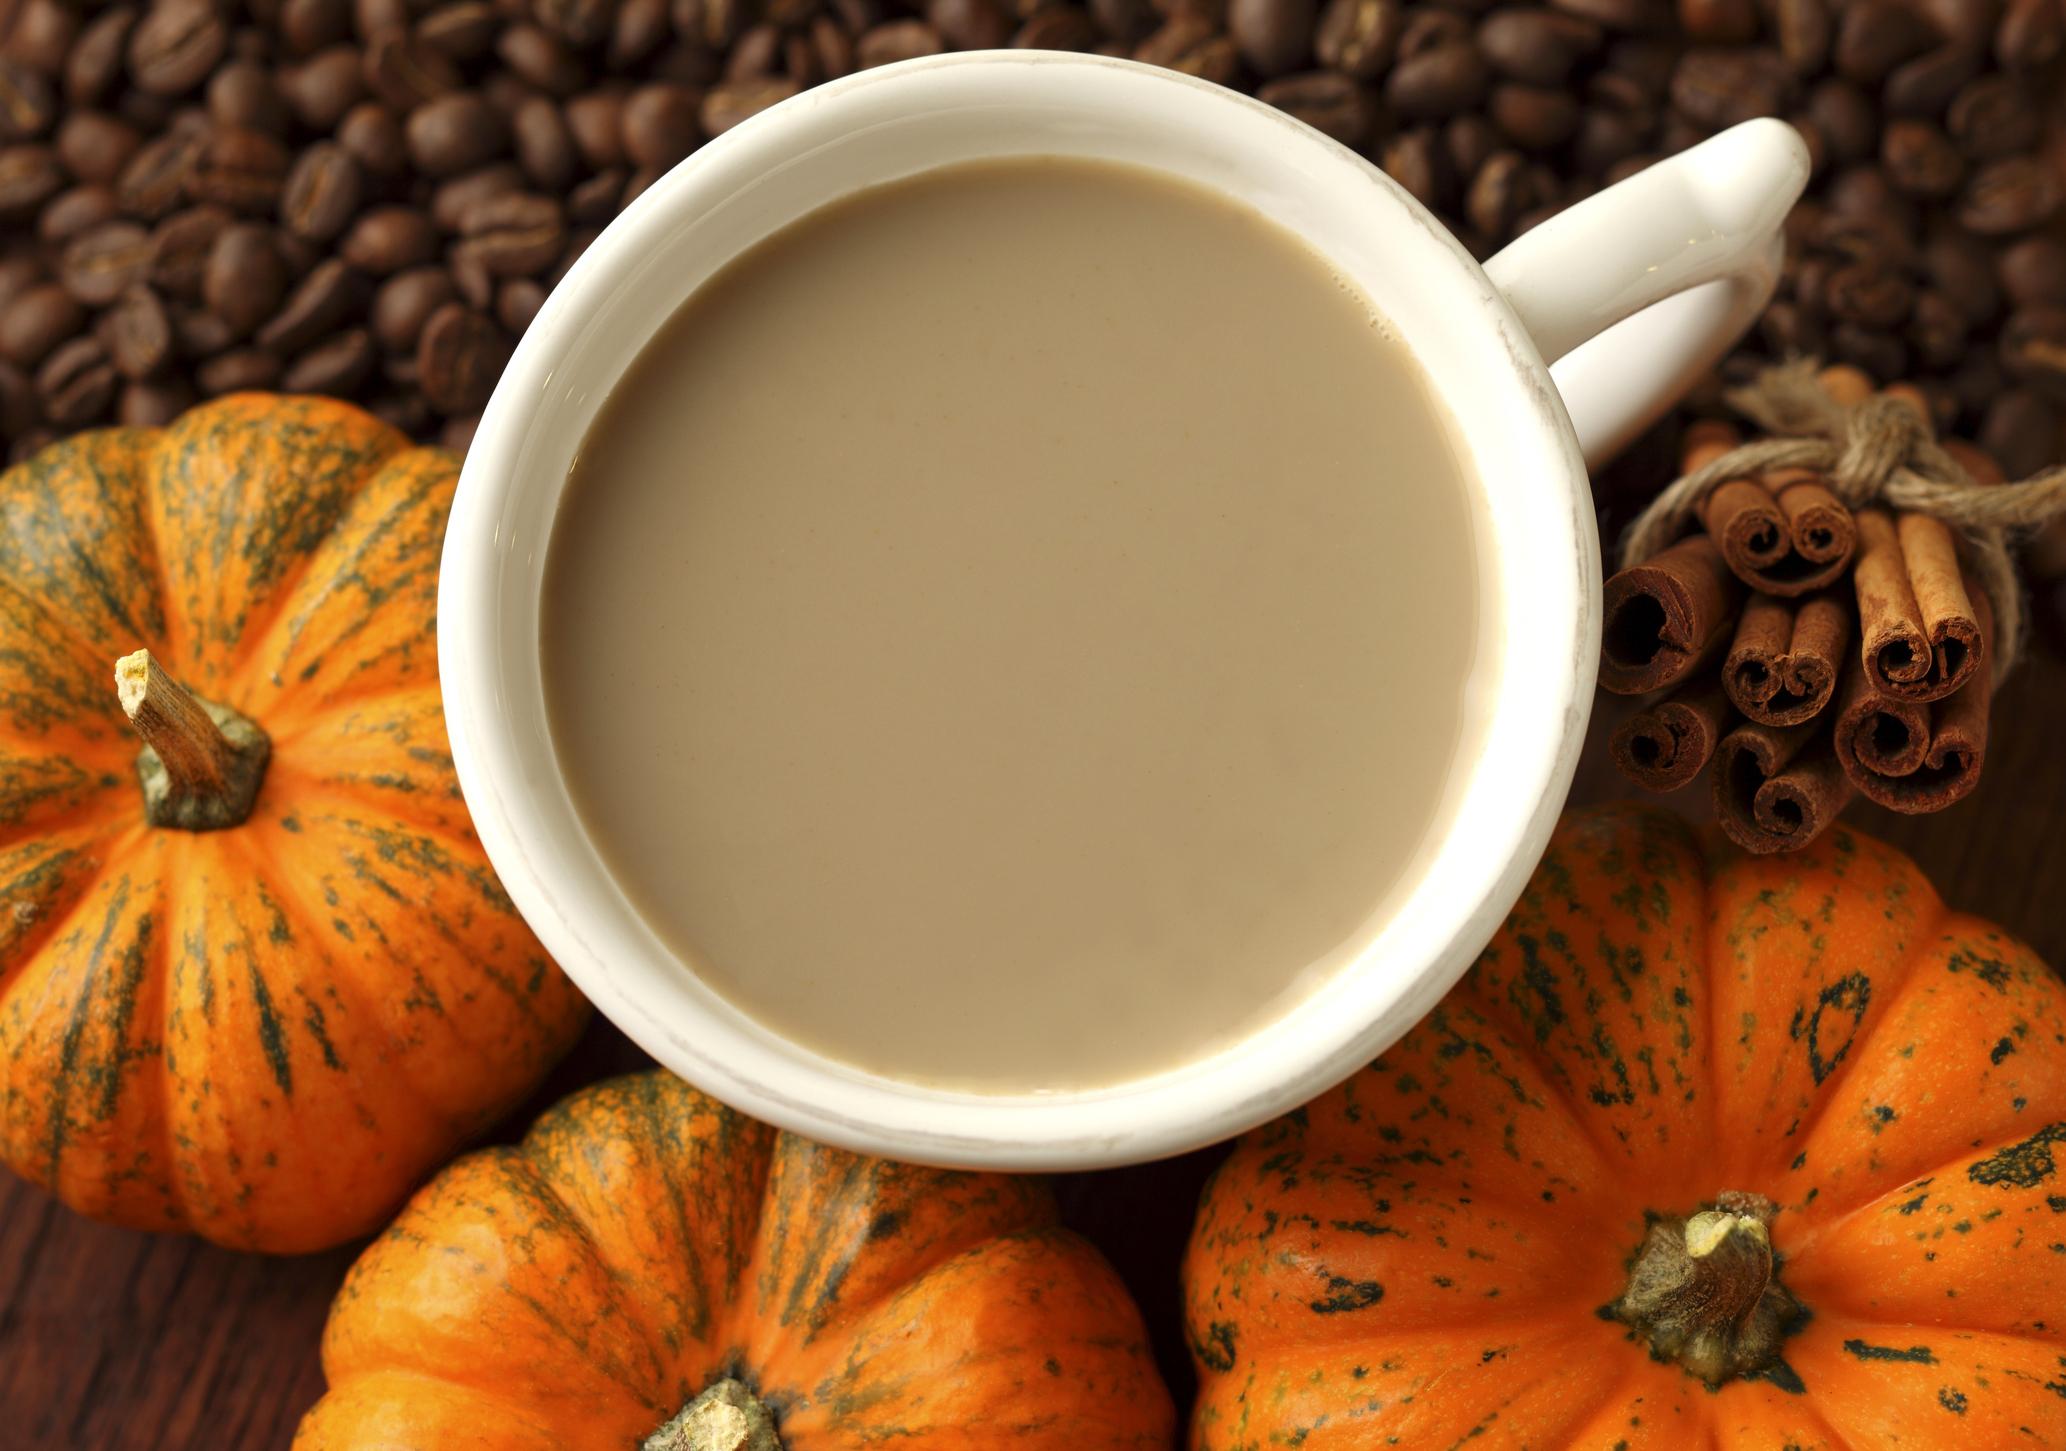 Pumpkin Spice Latte Returning to Starbucks August 28th